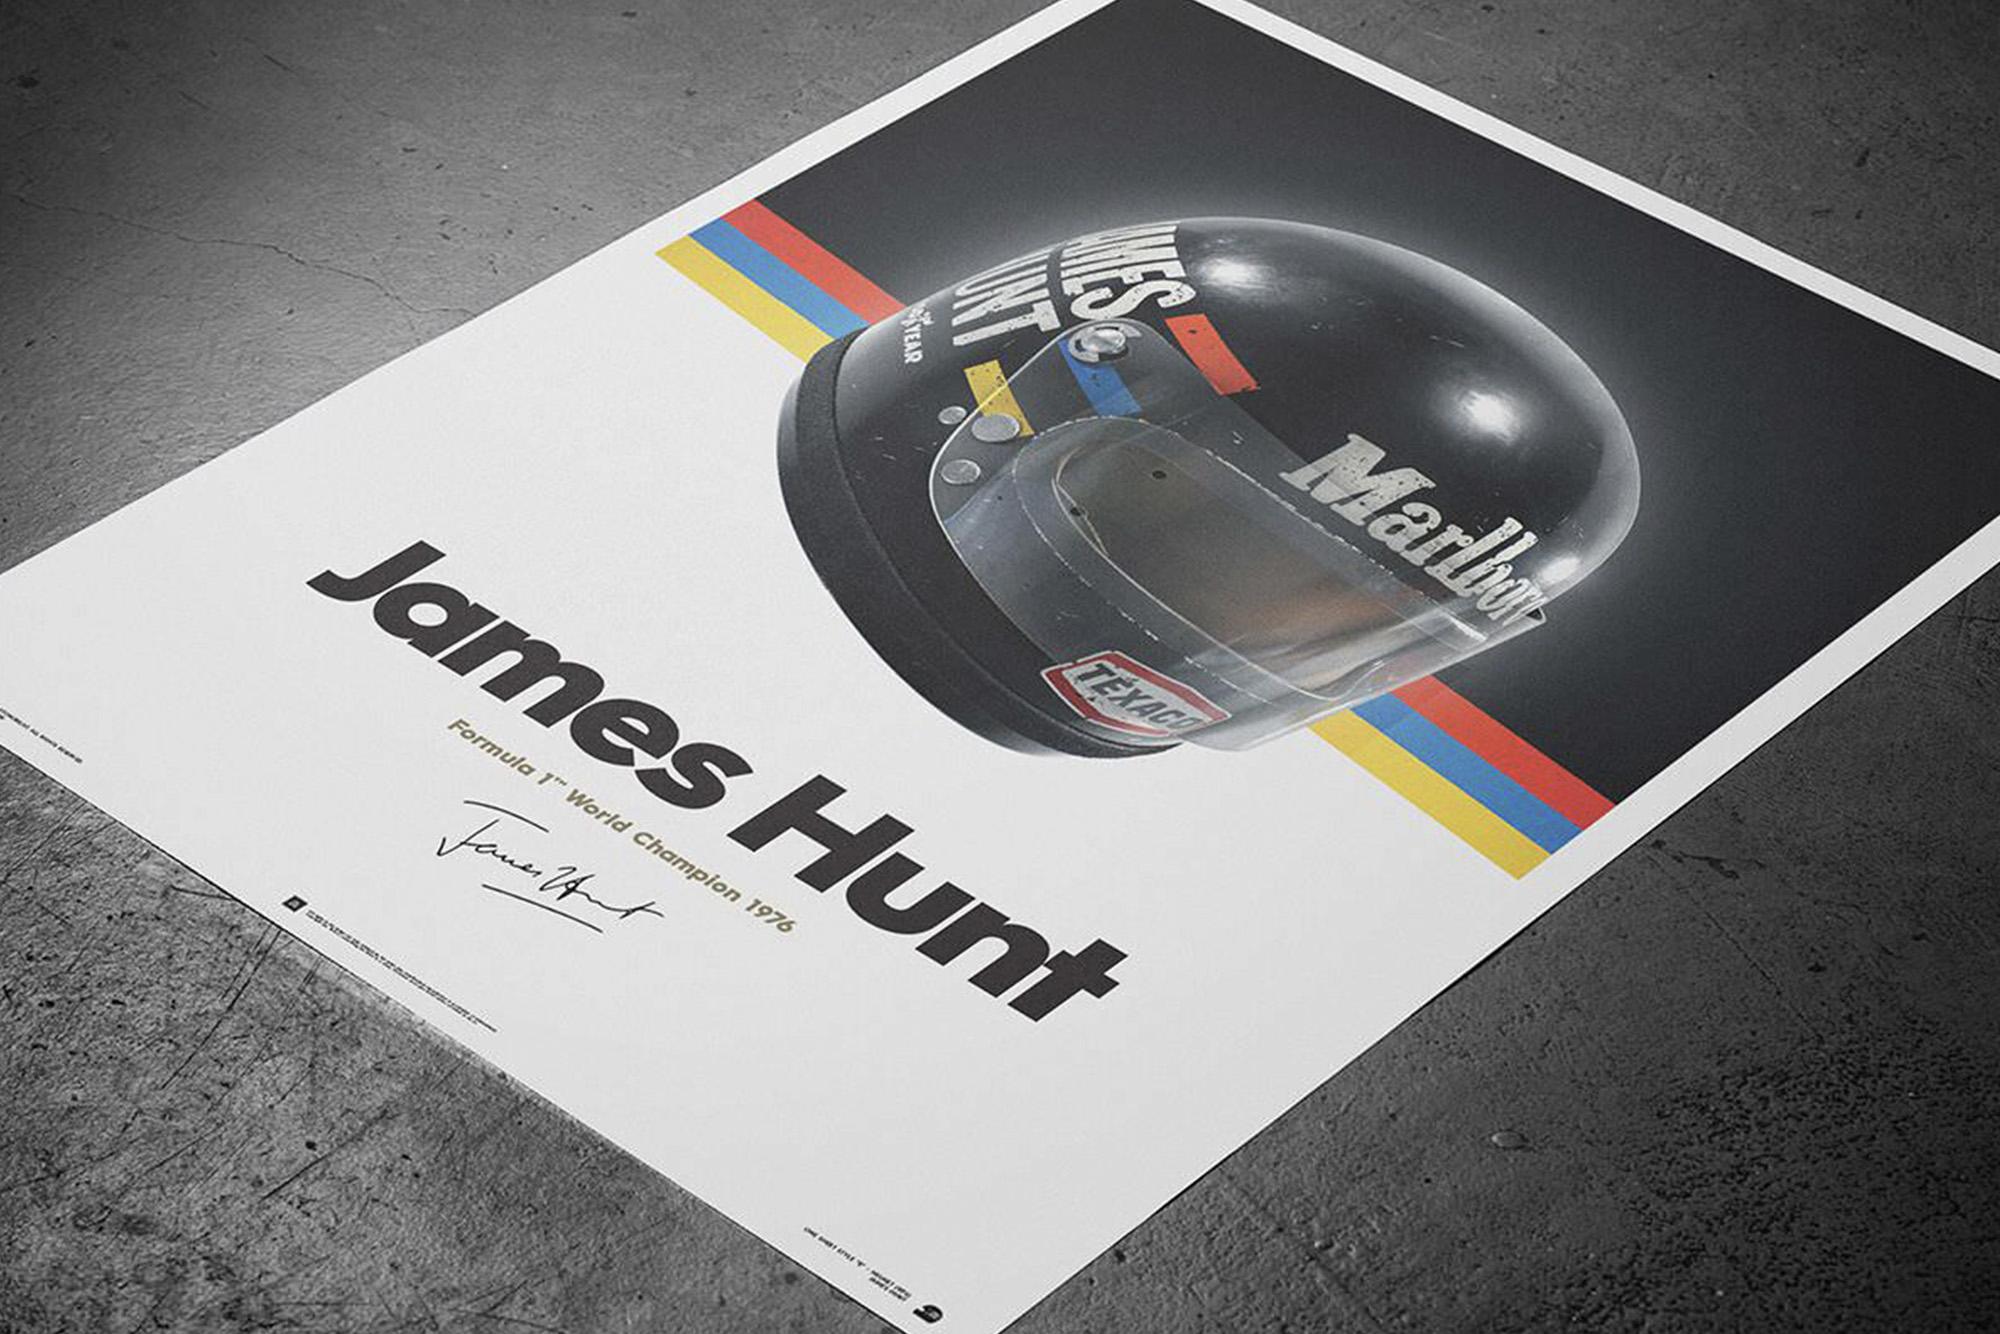 James Hunt Automobilist poster